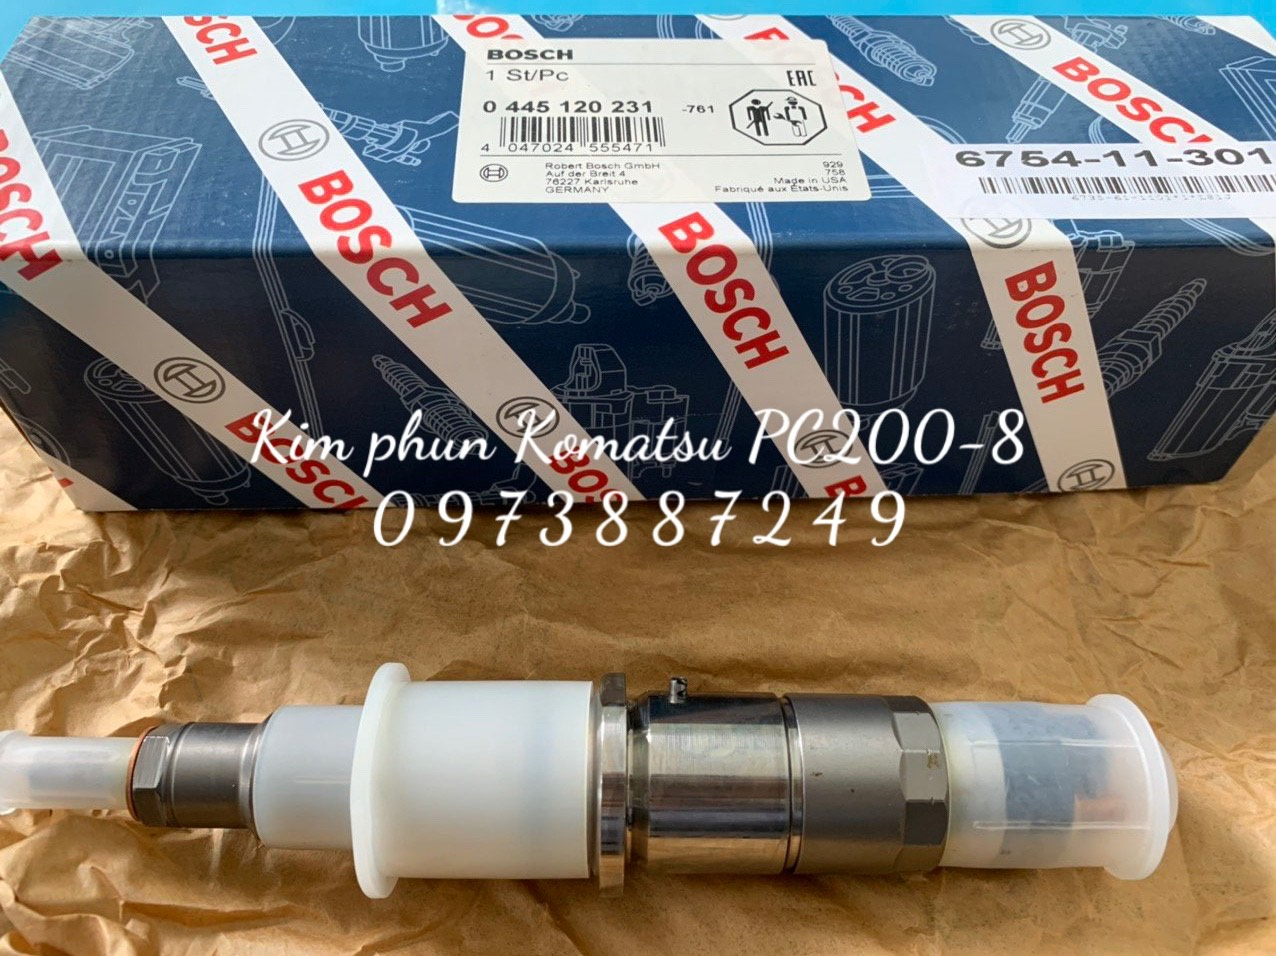 Bán kim phun Komatsu PC200-8, SAA6D107 giá tốt nhất